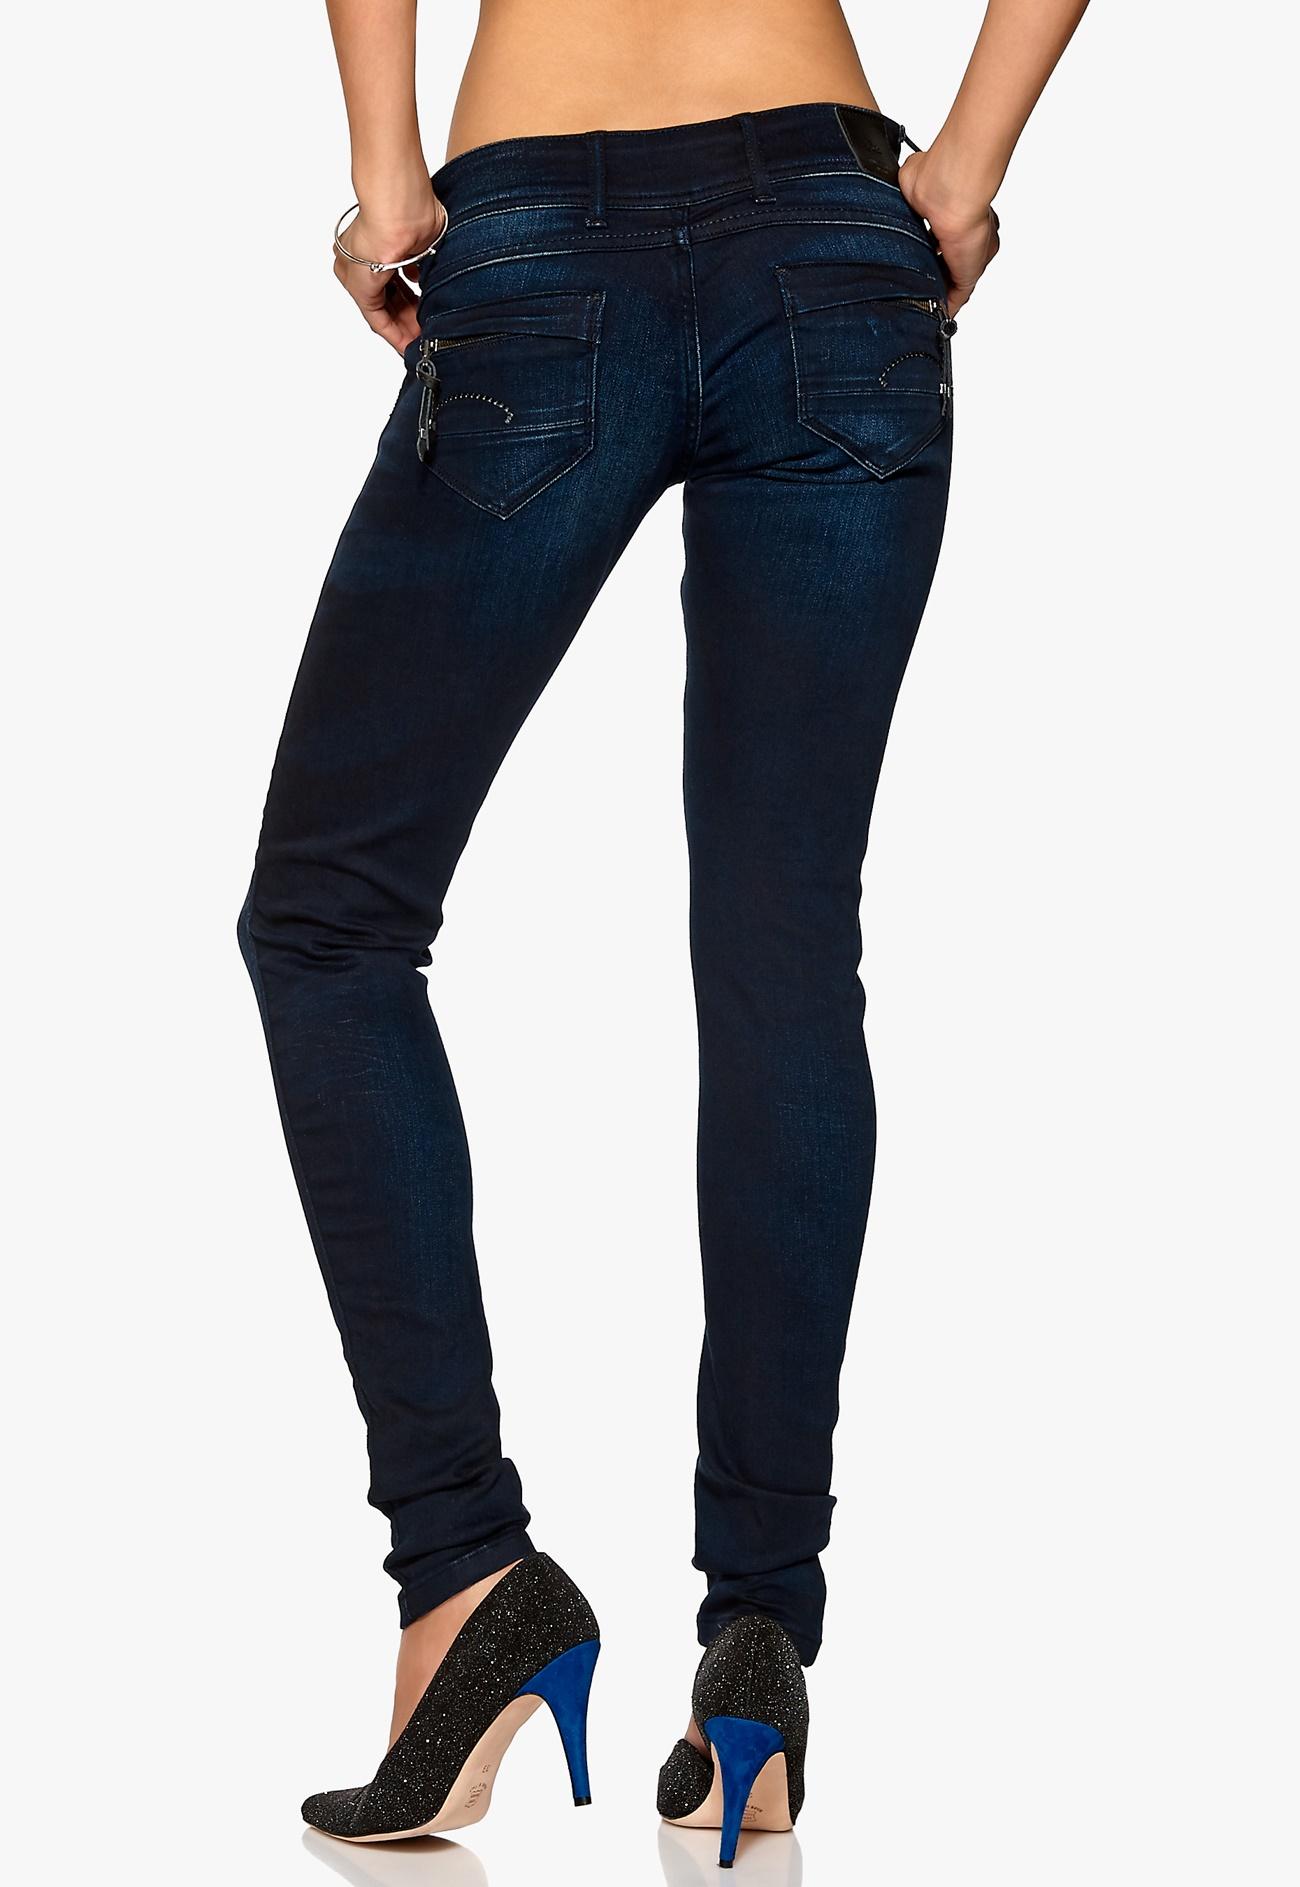 g star midge cody skinny jeans 6133 dk aged bubbleroom. Black Bedroom Furniture Sets. Home Design Ideas